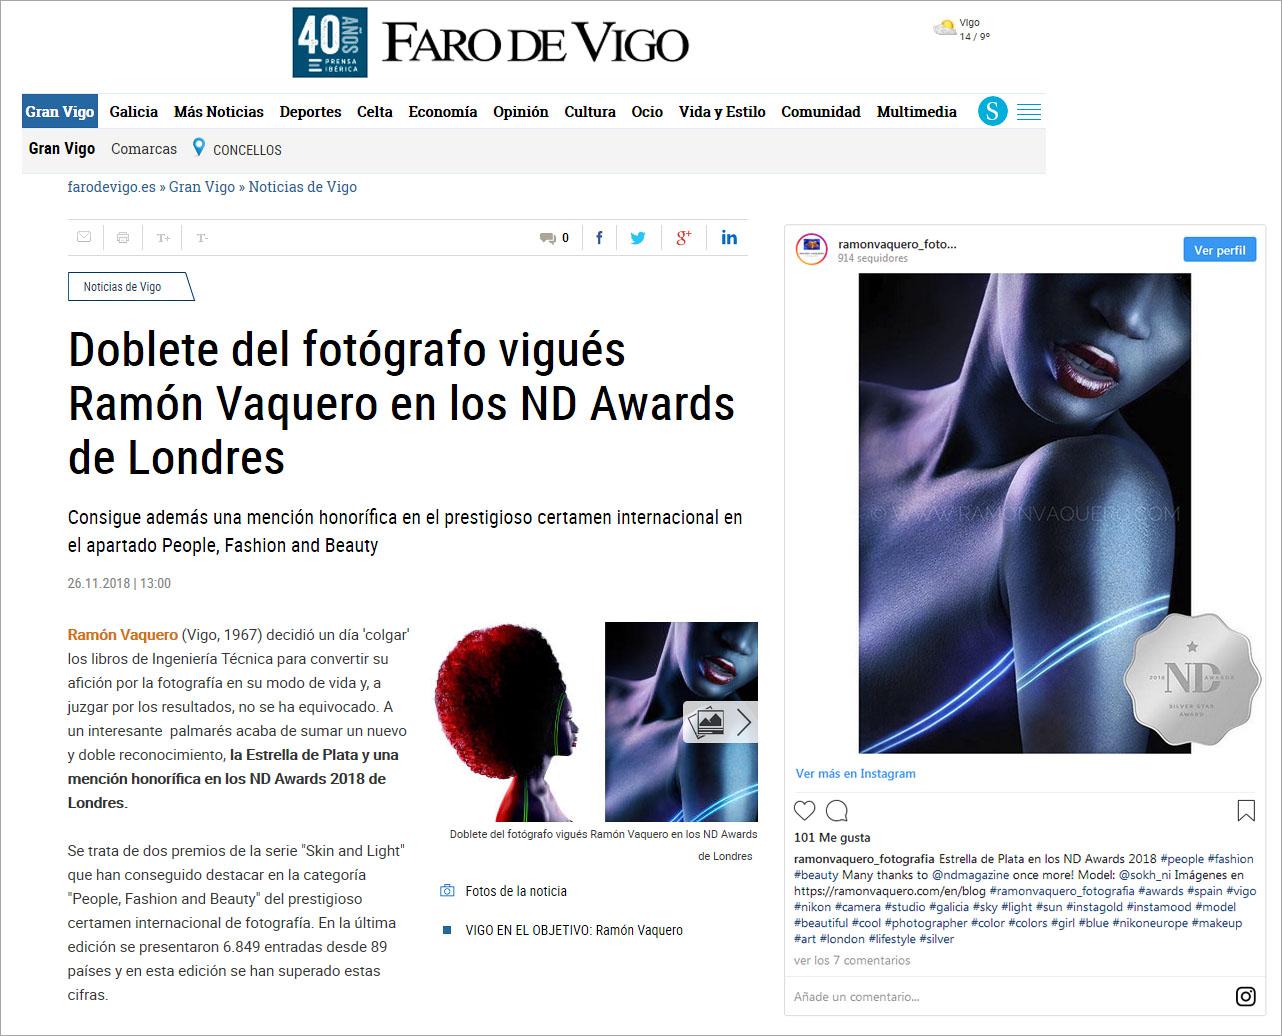 ramon-vaquero_faro-de-vigo-nd-awards-2018